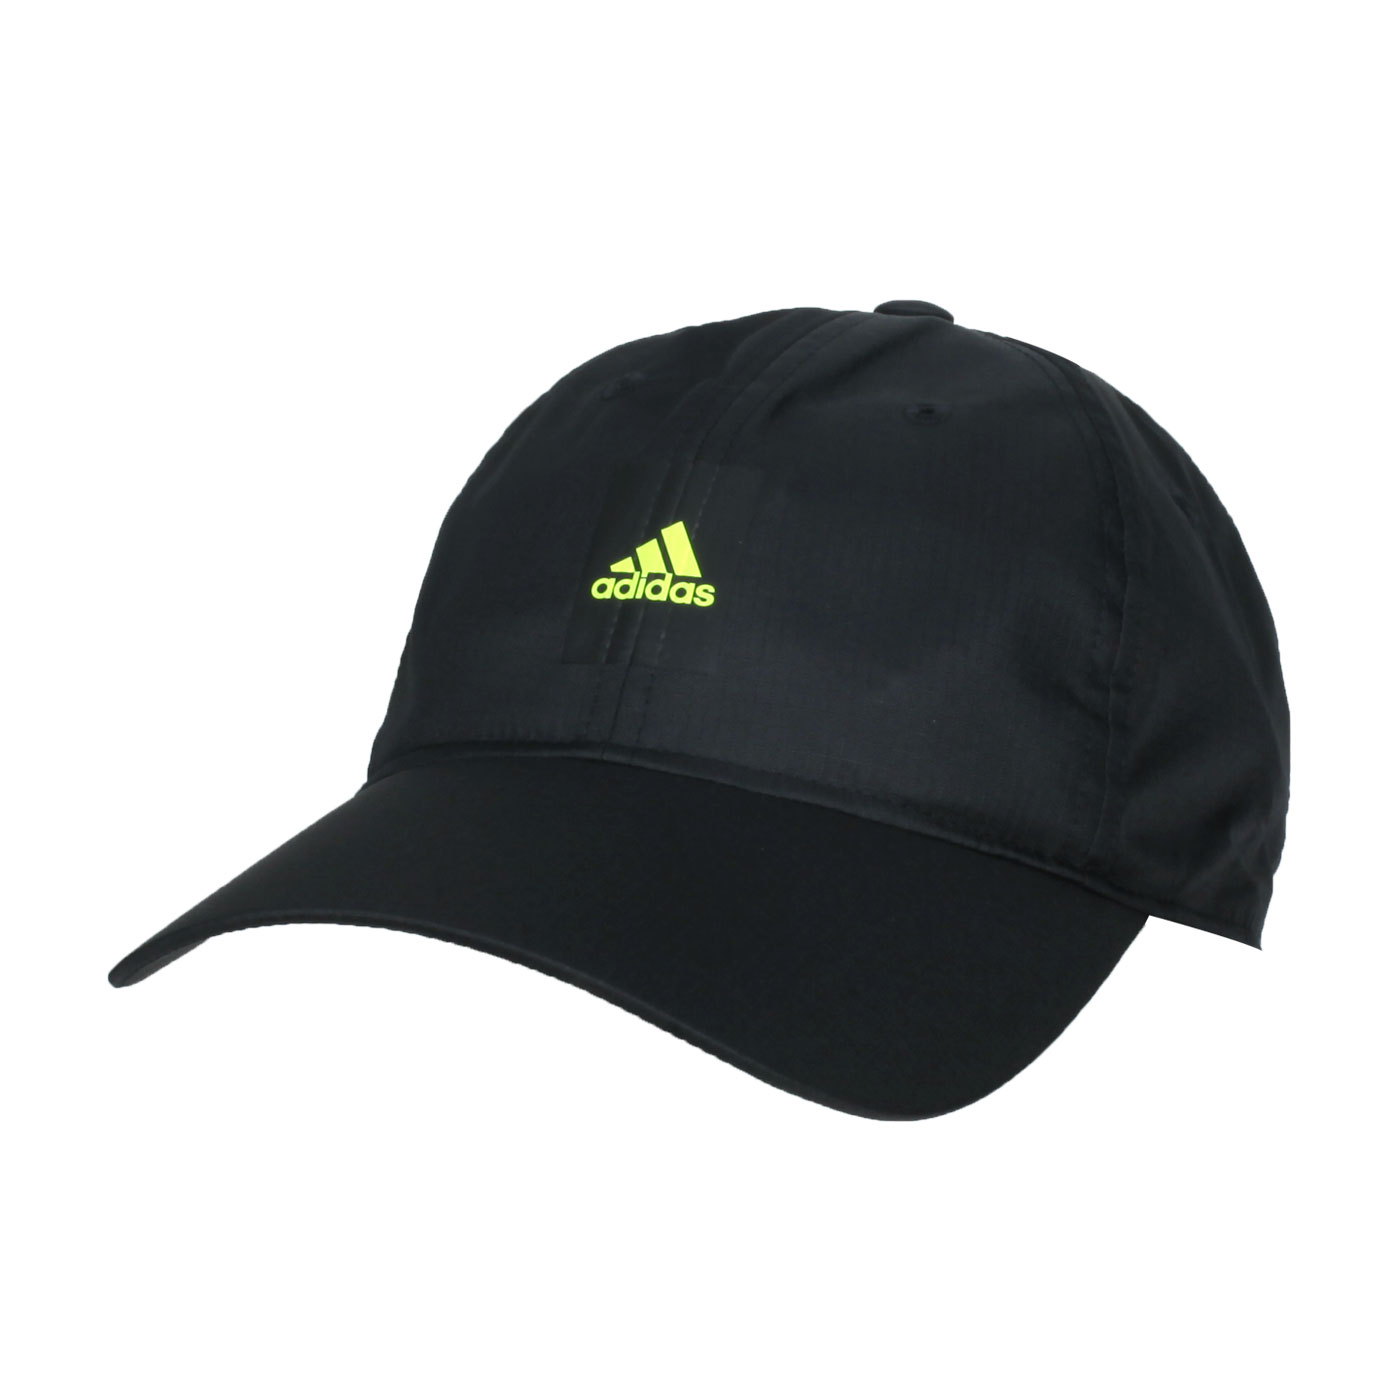 ADIDAS 帽子 GN2002